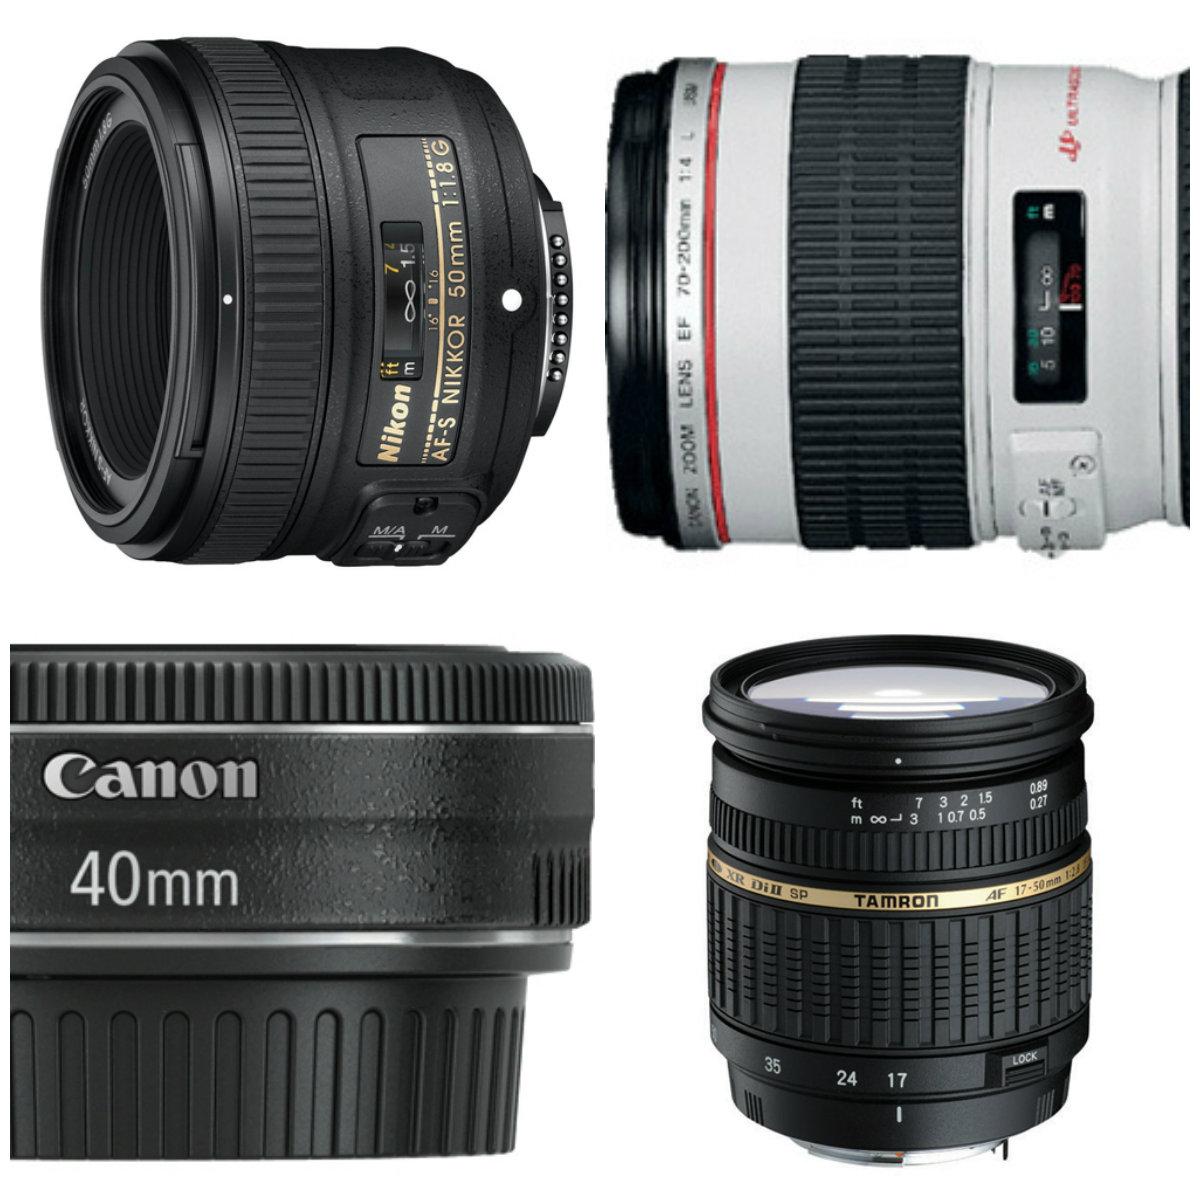 Choosing a good lens for a camera